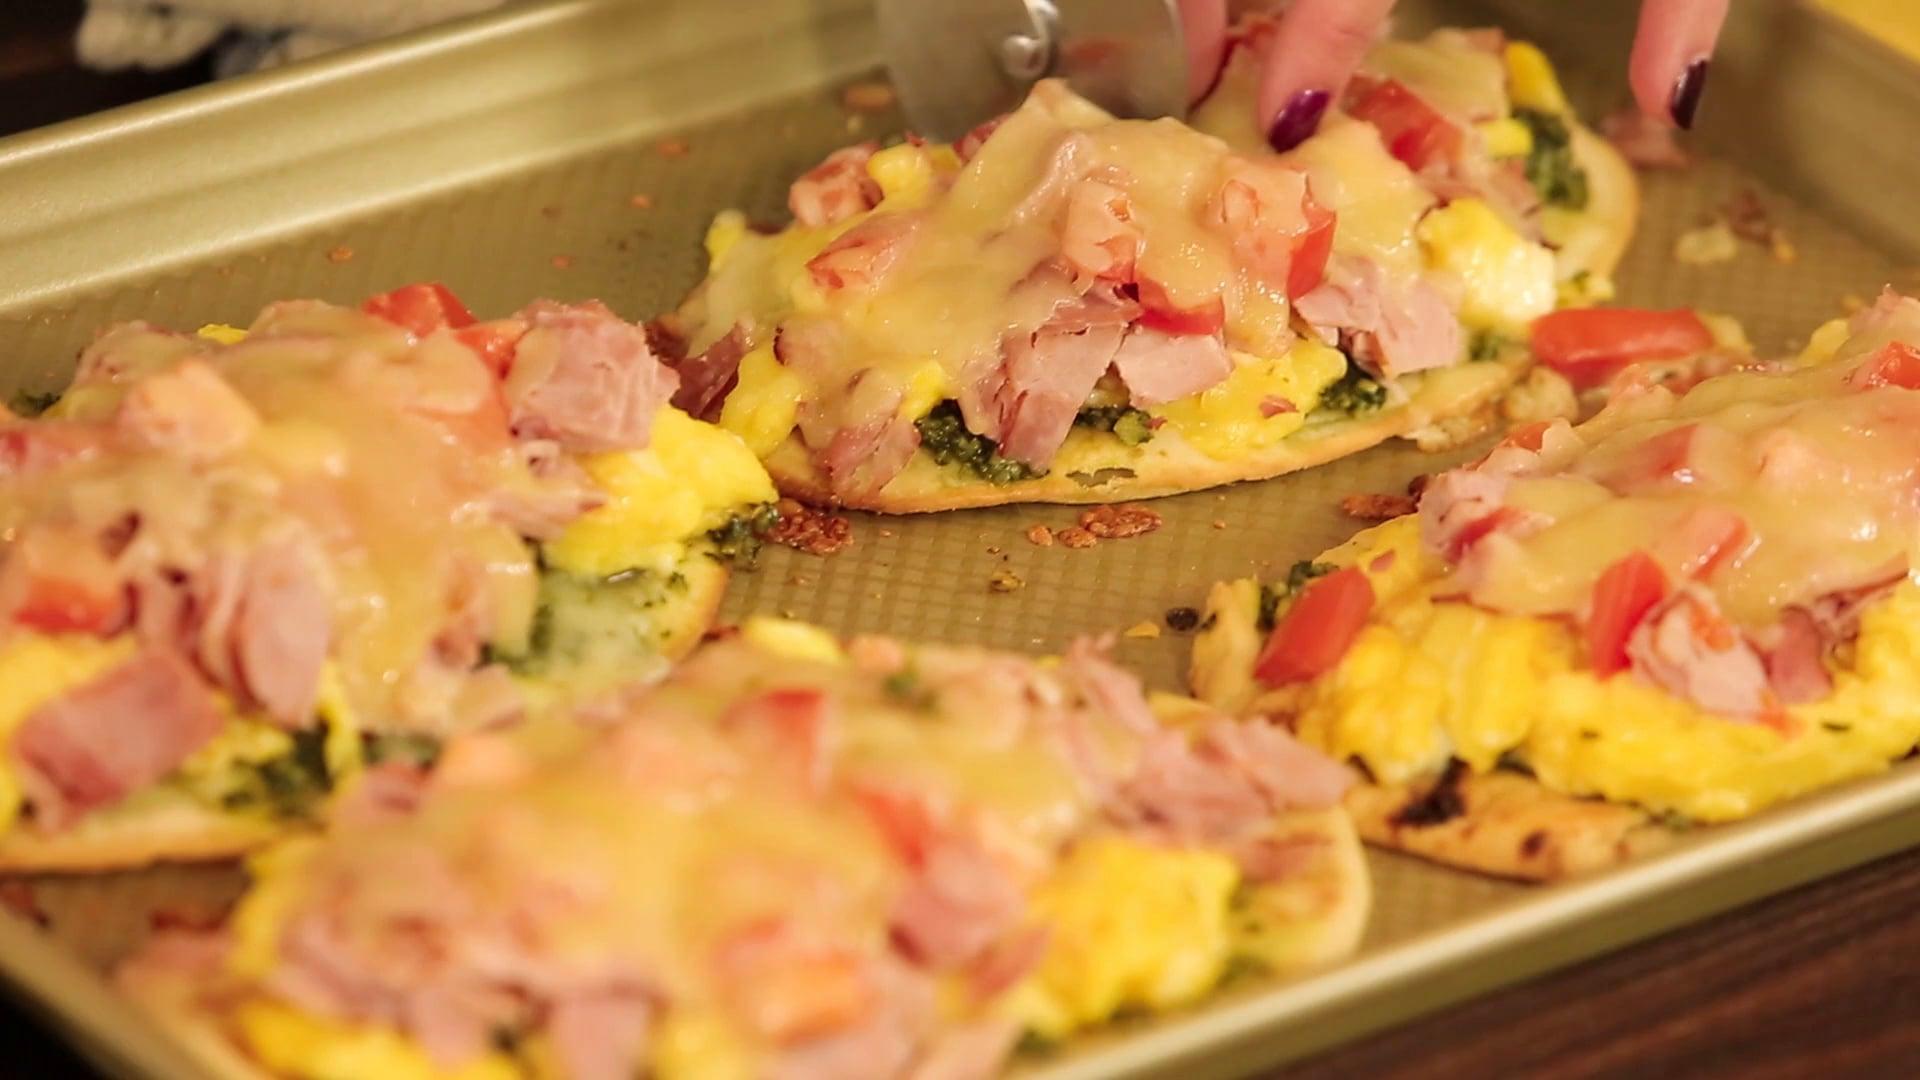 Green Eggs & Ham (Everyday Dishes & DIY)